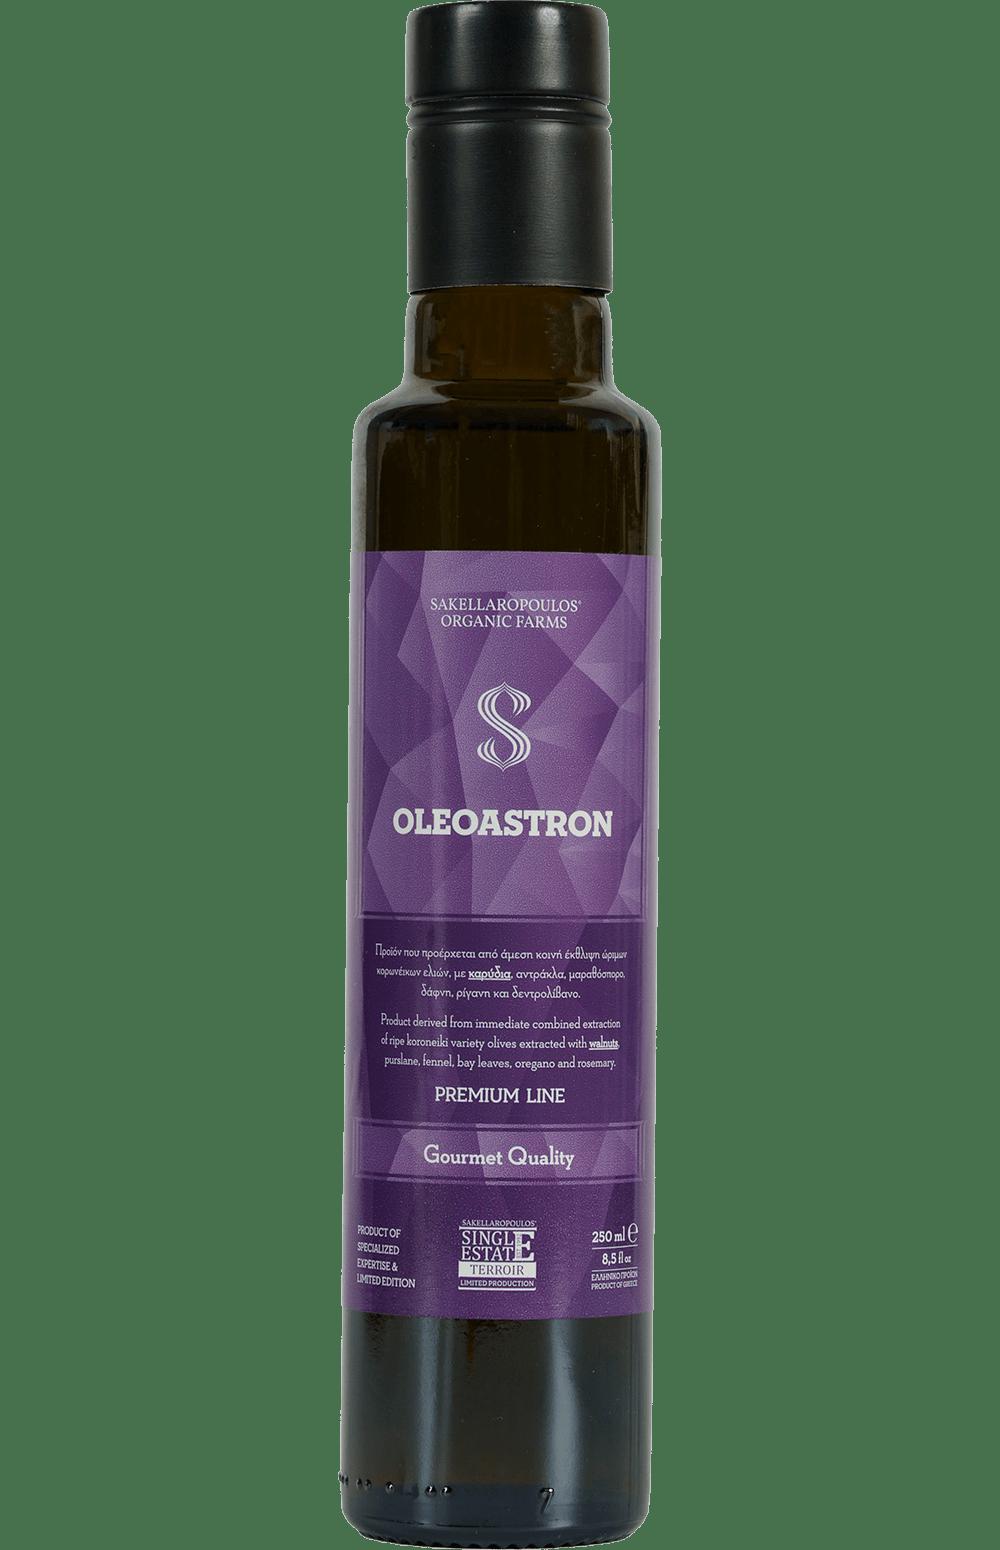 Sakellaropoulos Organic Farms